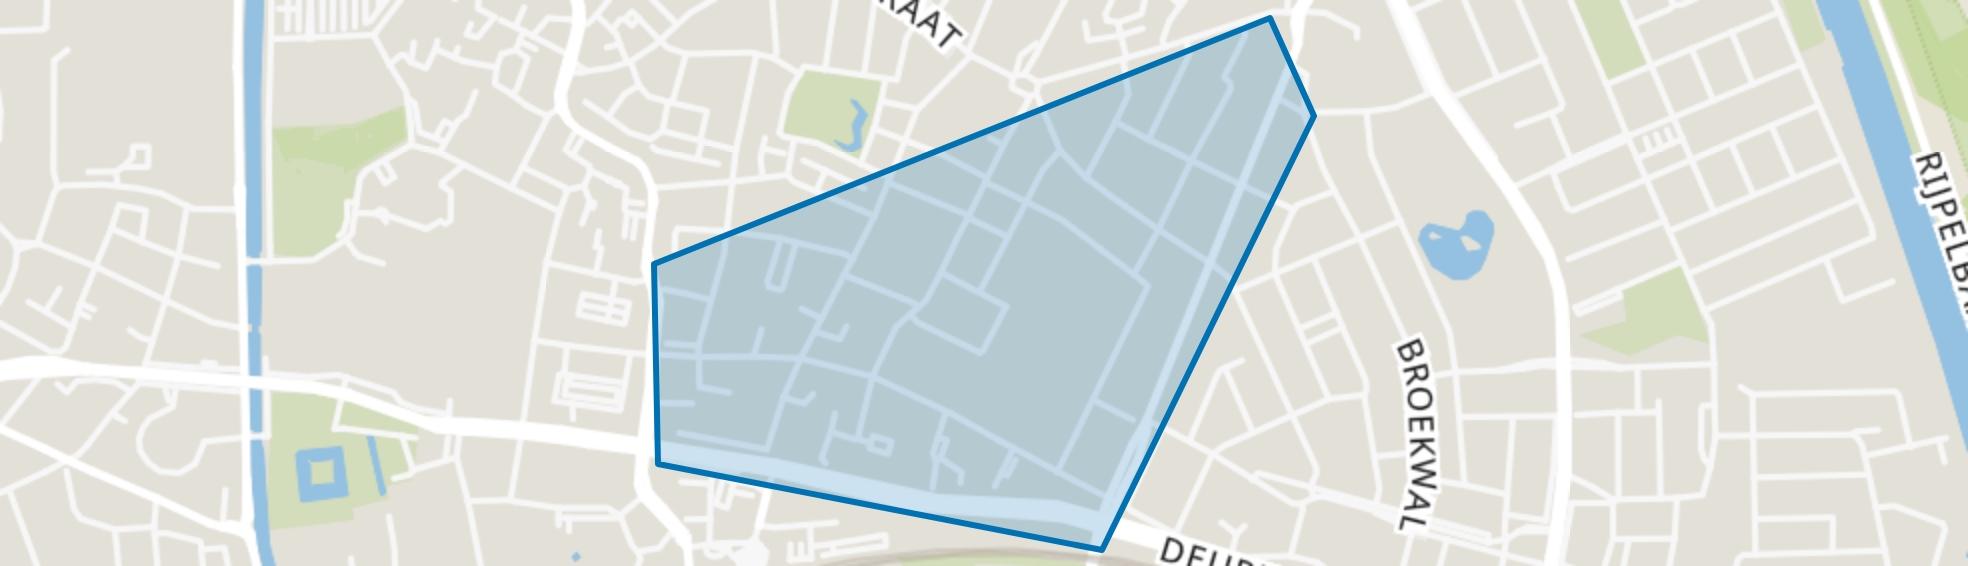 Vossenberg, Helmond map